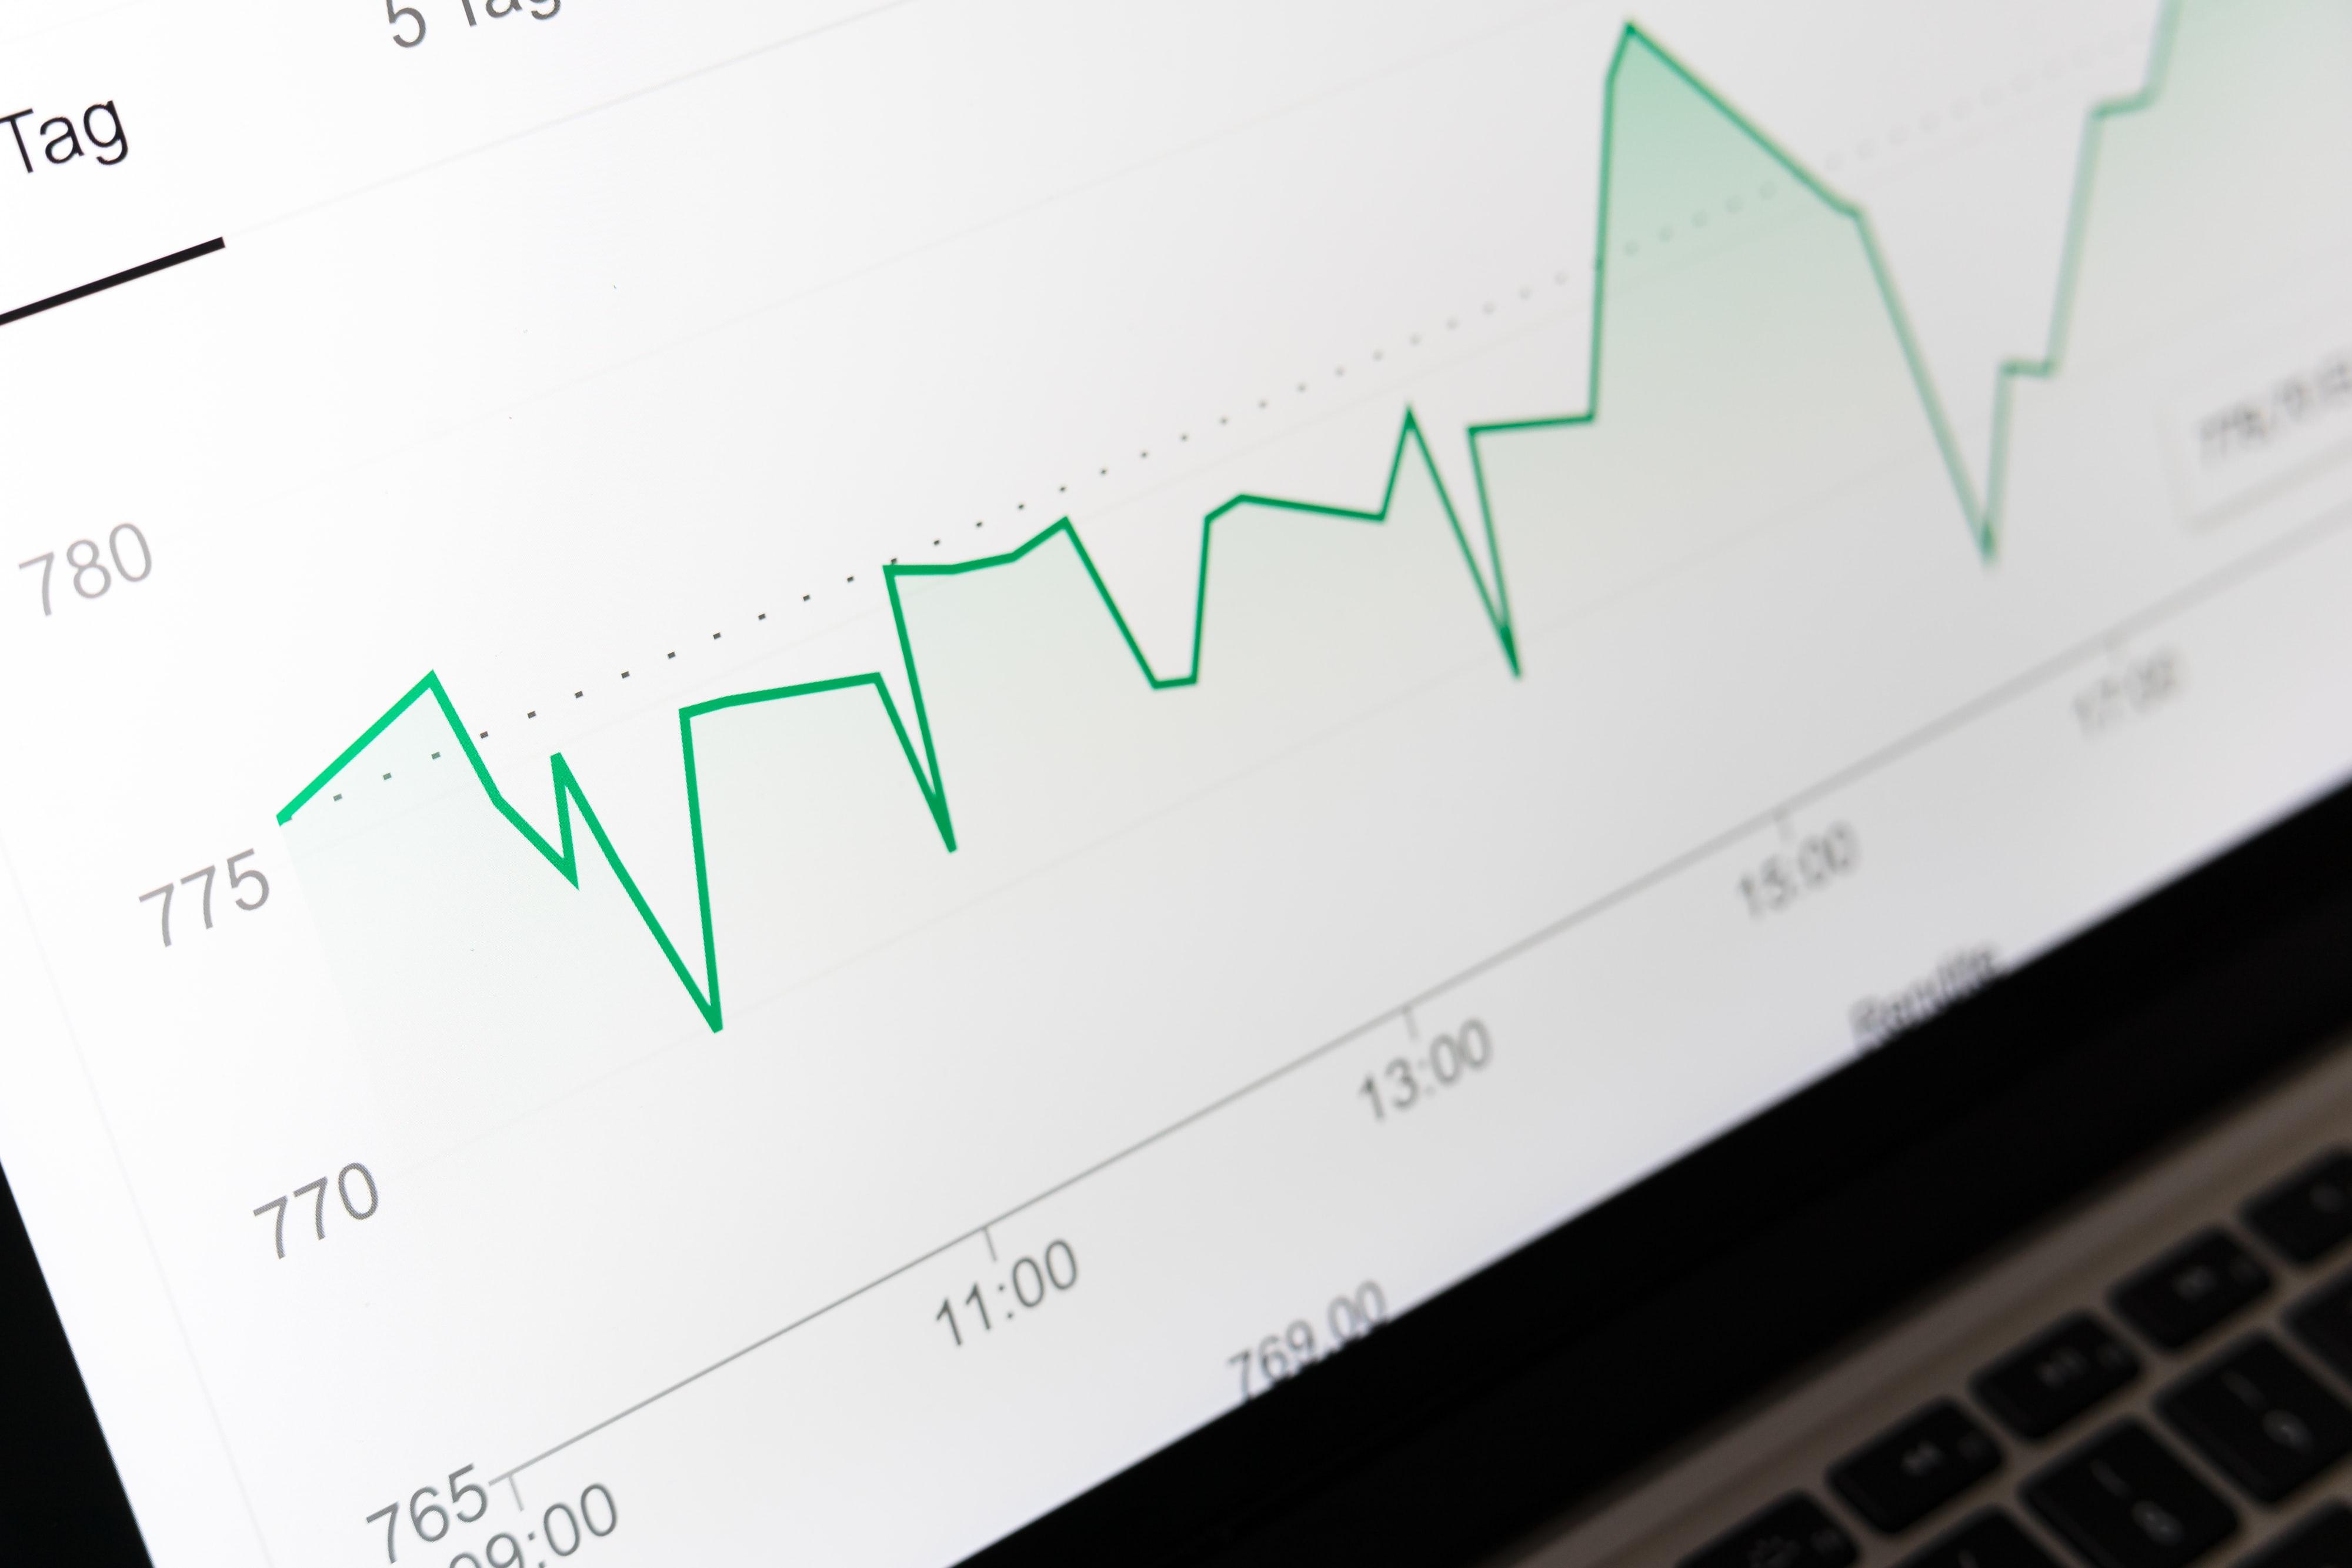 ATS pricing chart